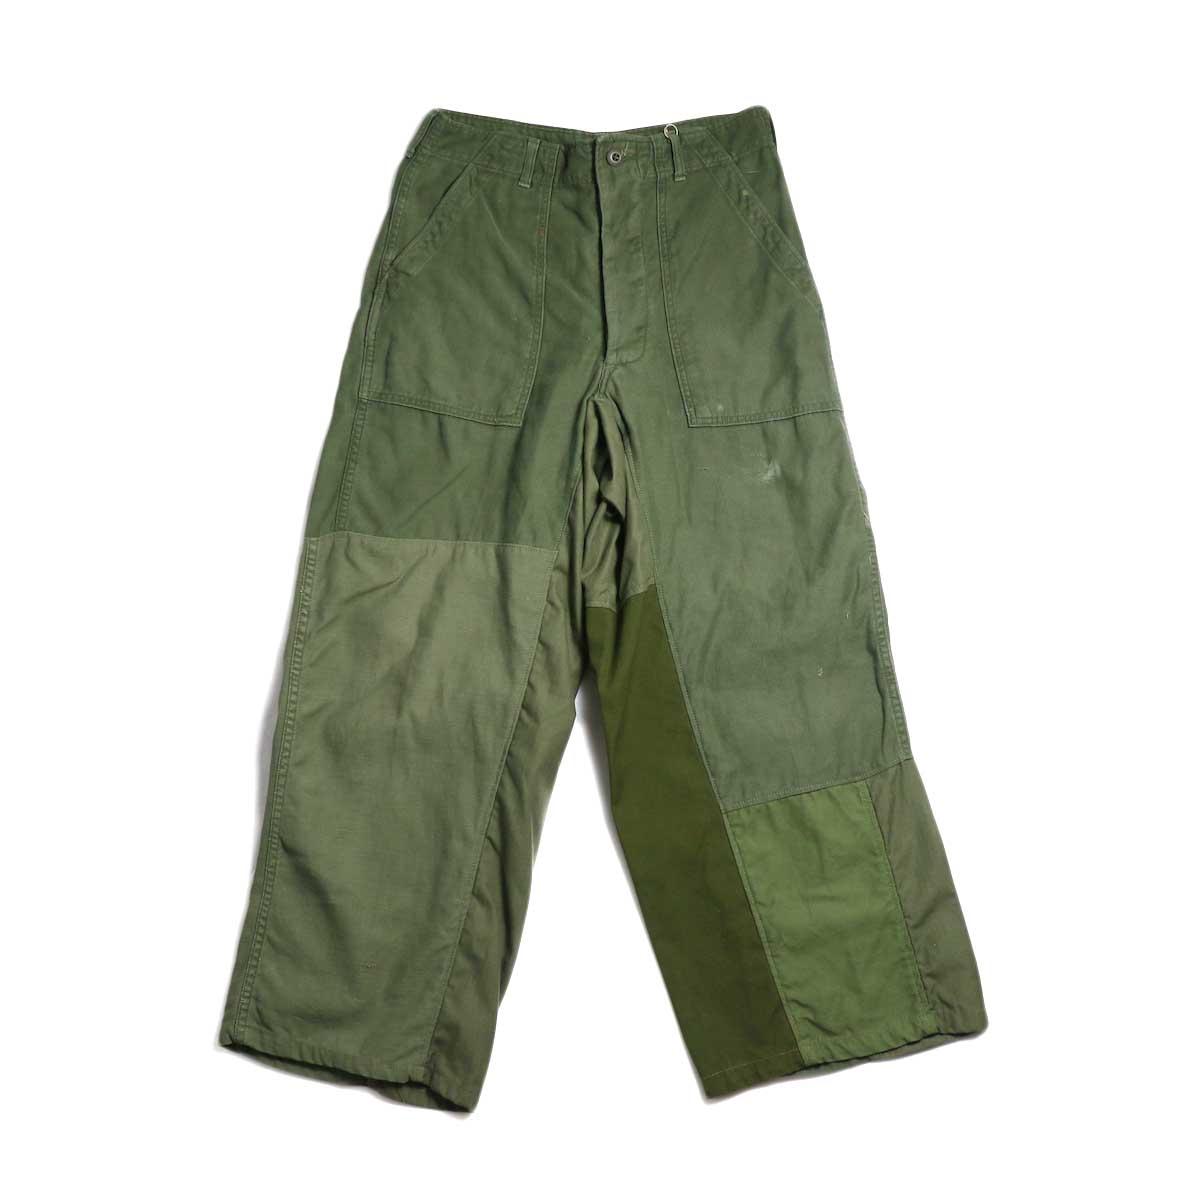 BONUM / Military FAT Pants (A)